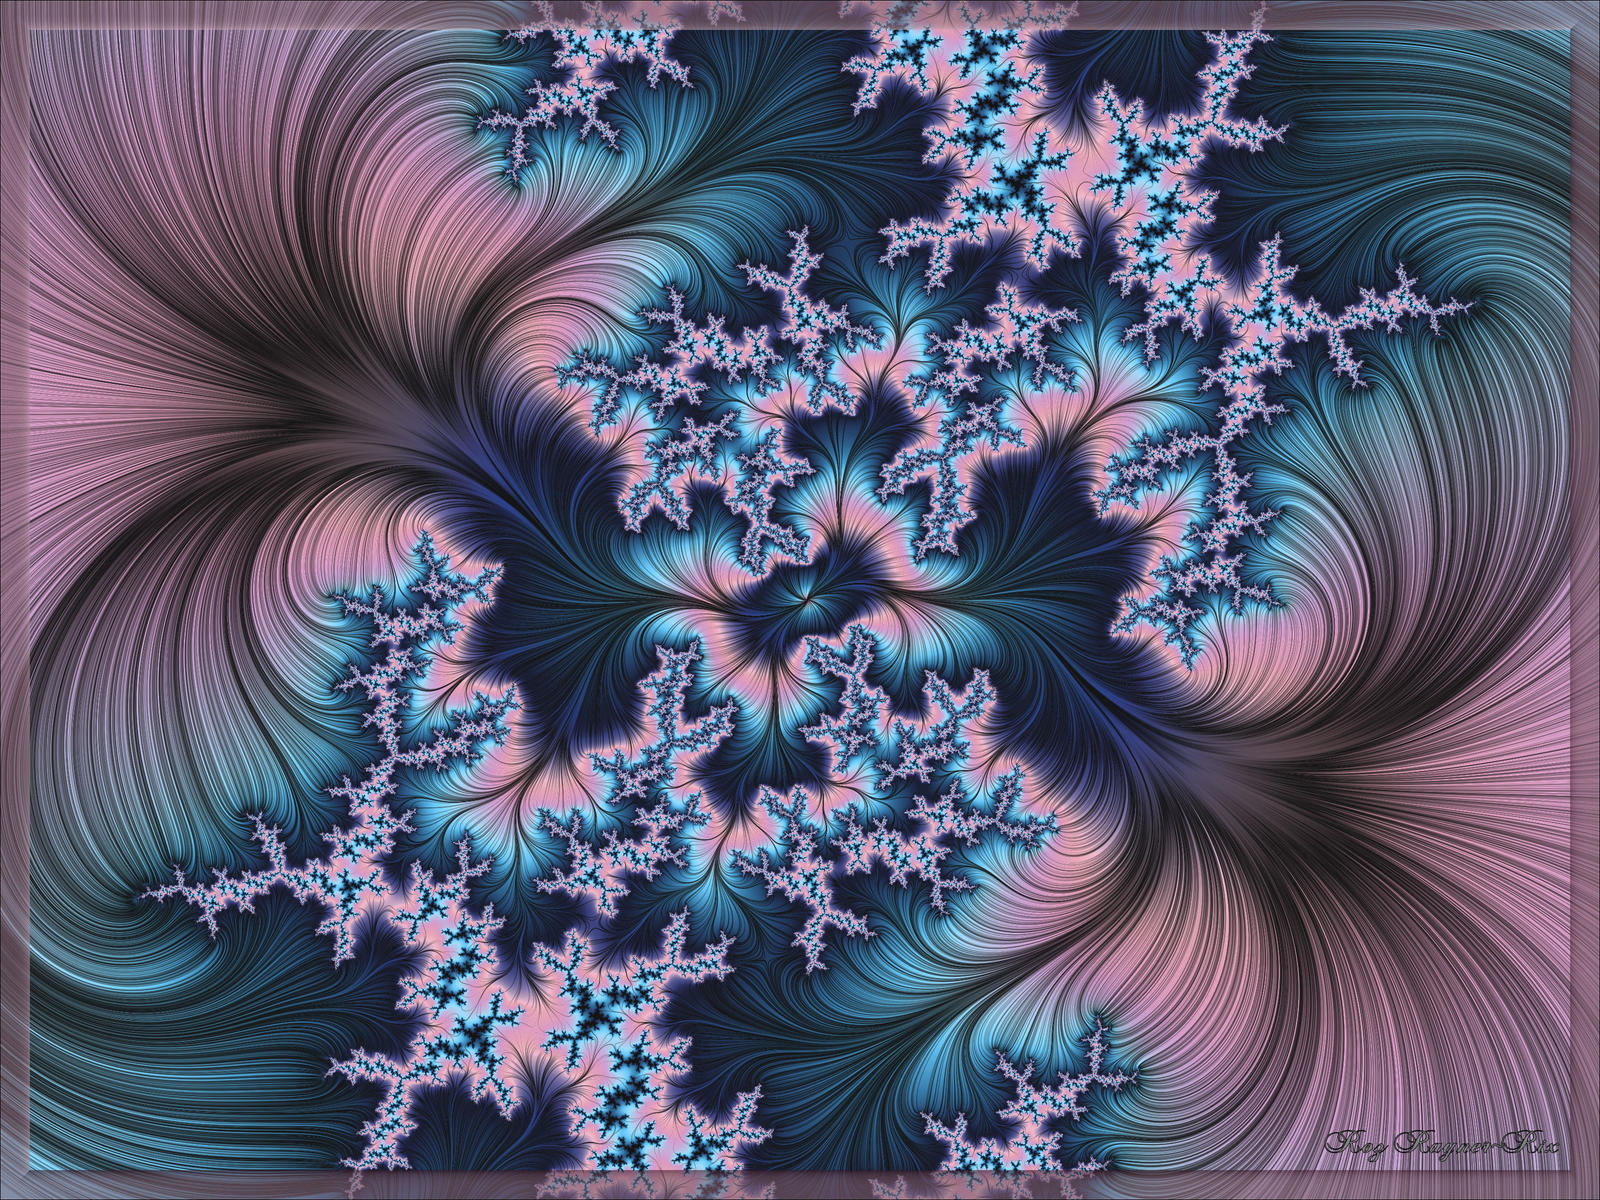 Blue Dreamer by Rozrr